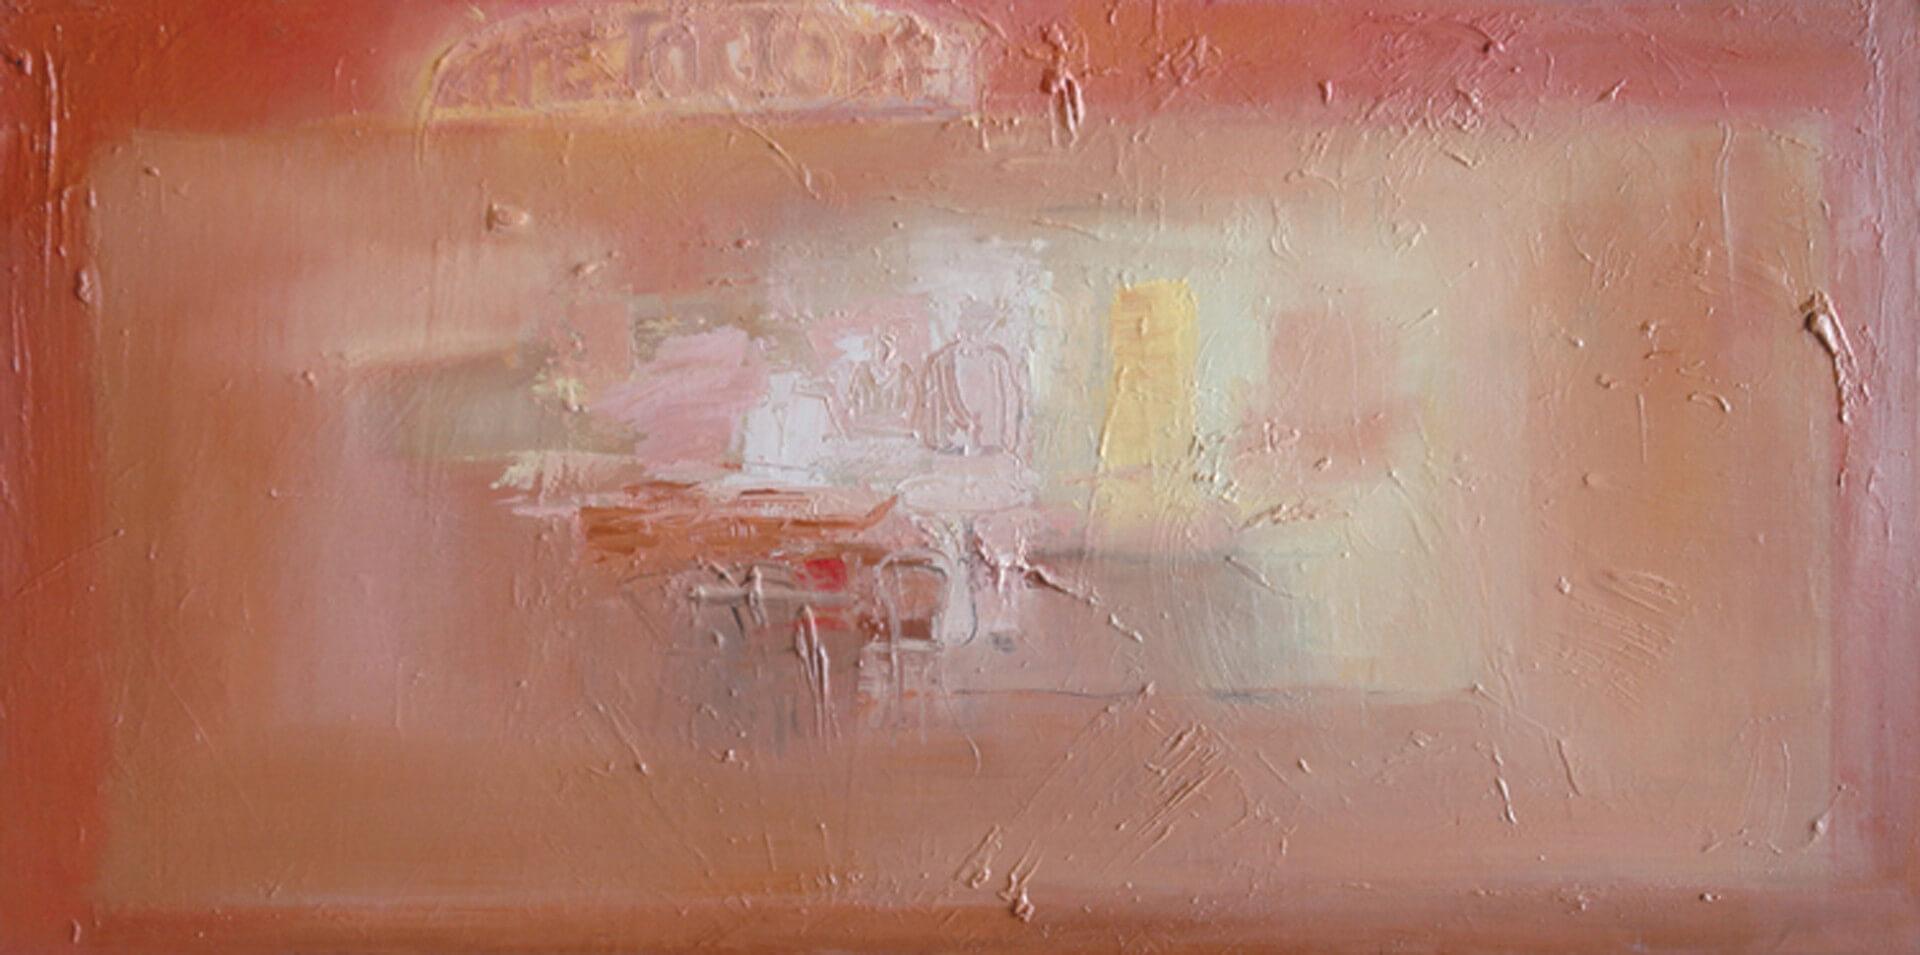 2007 - Oil on canvas. 60 cm. x 100 cm.